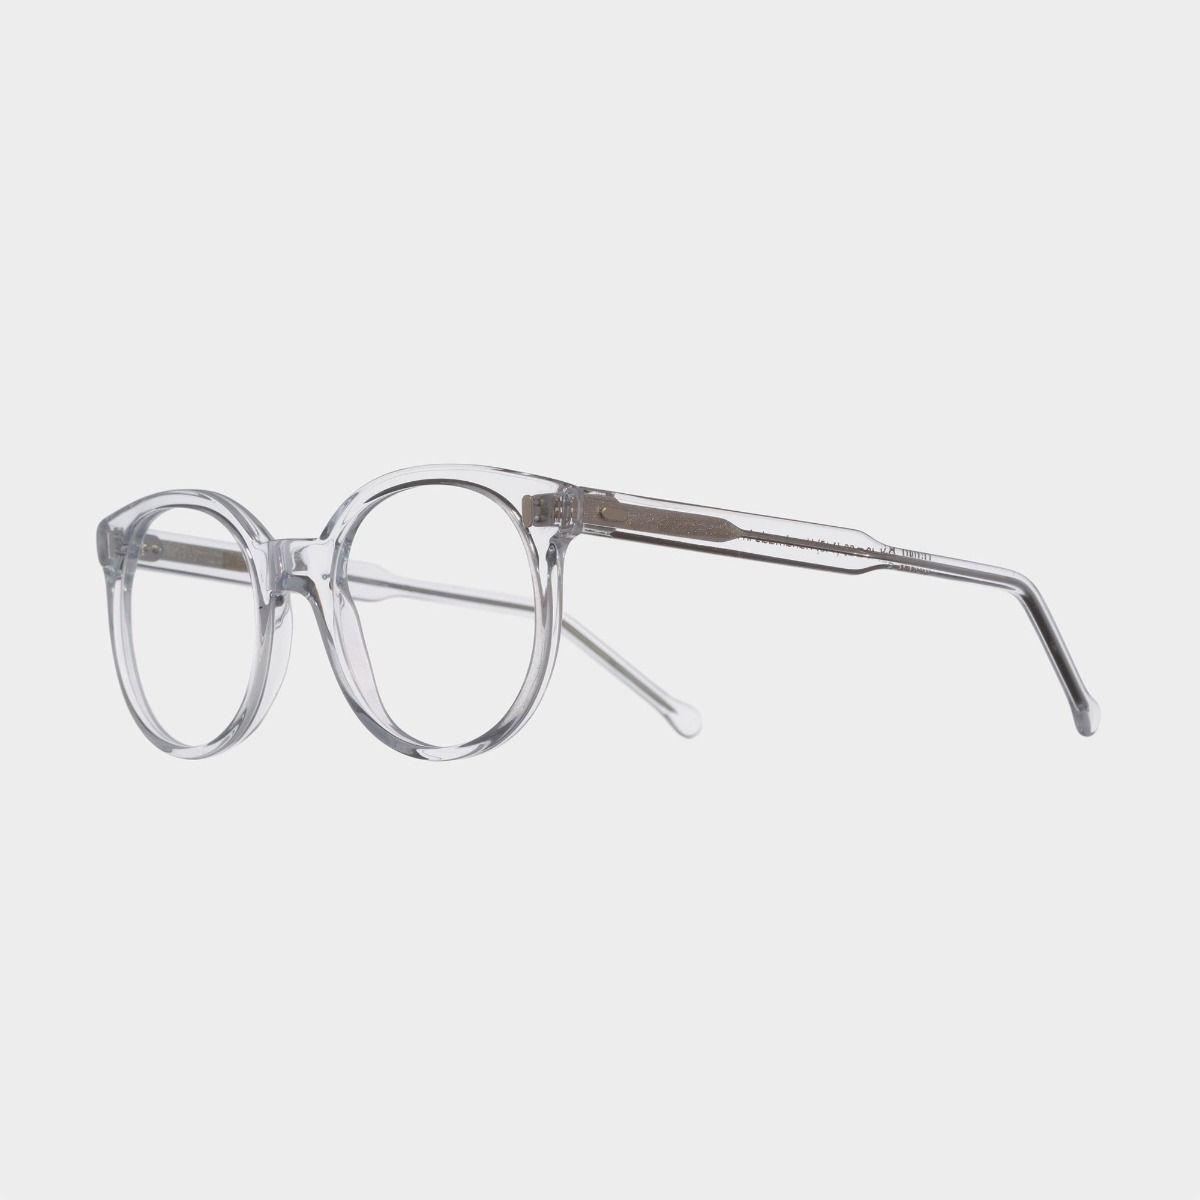 1026 Optical Round Glasses